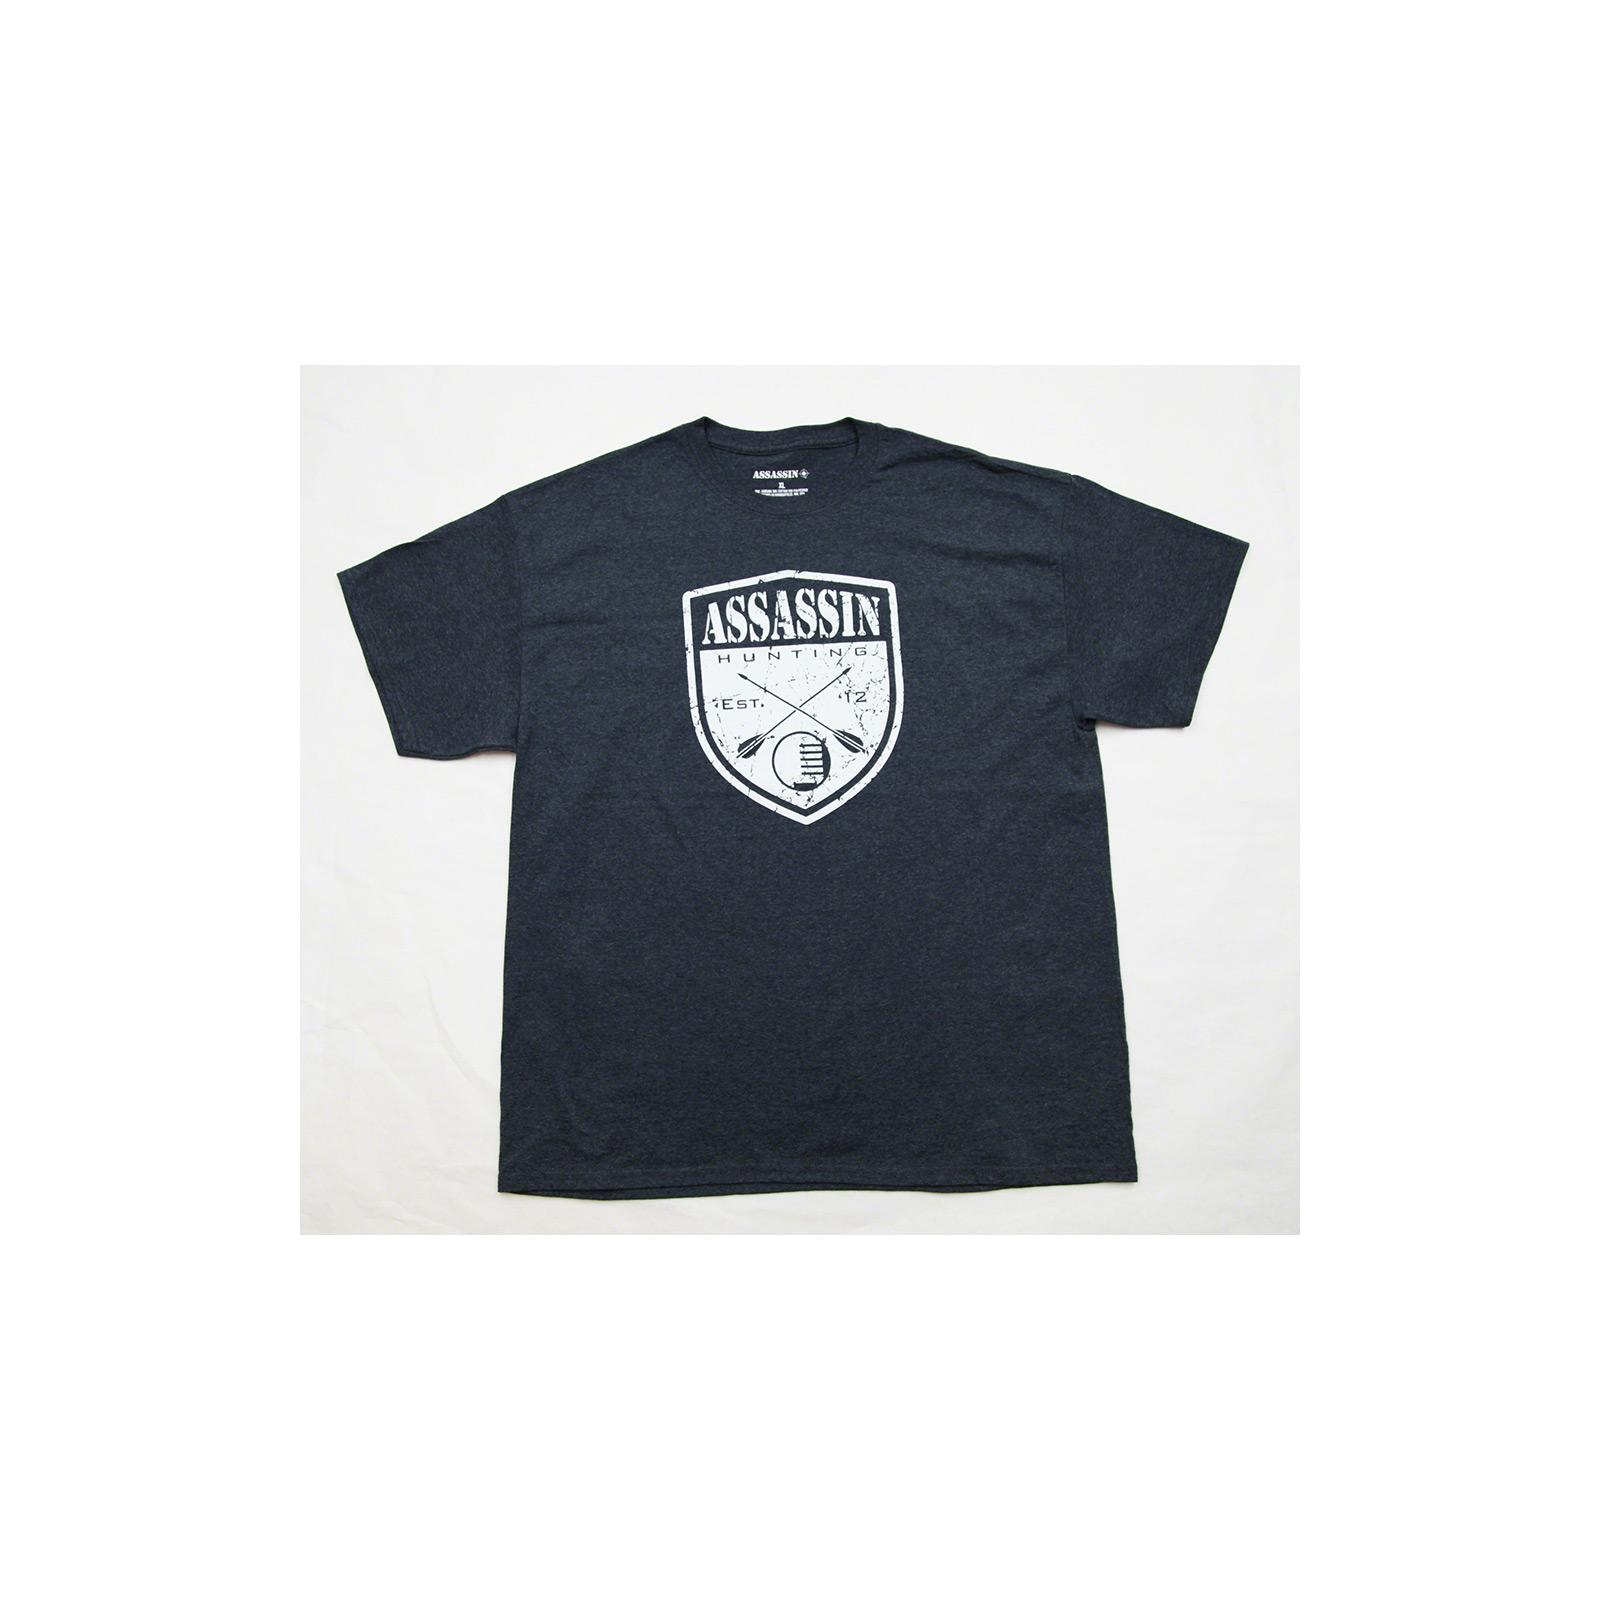 Assassin Fishing T-Shirt Charcoal Archery Shield-M, MTCHLARCHSHIELD-M